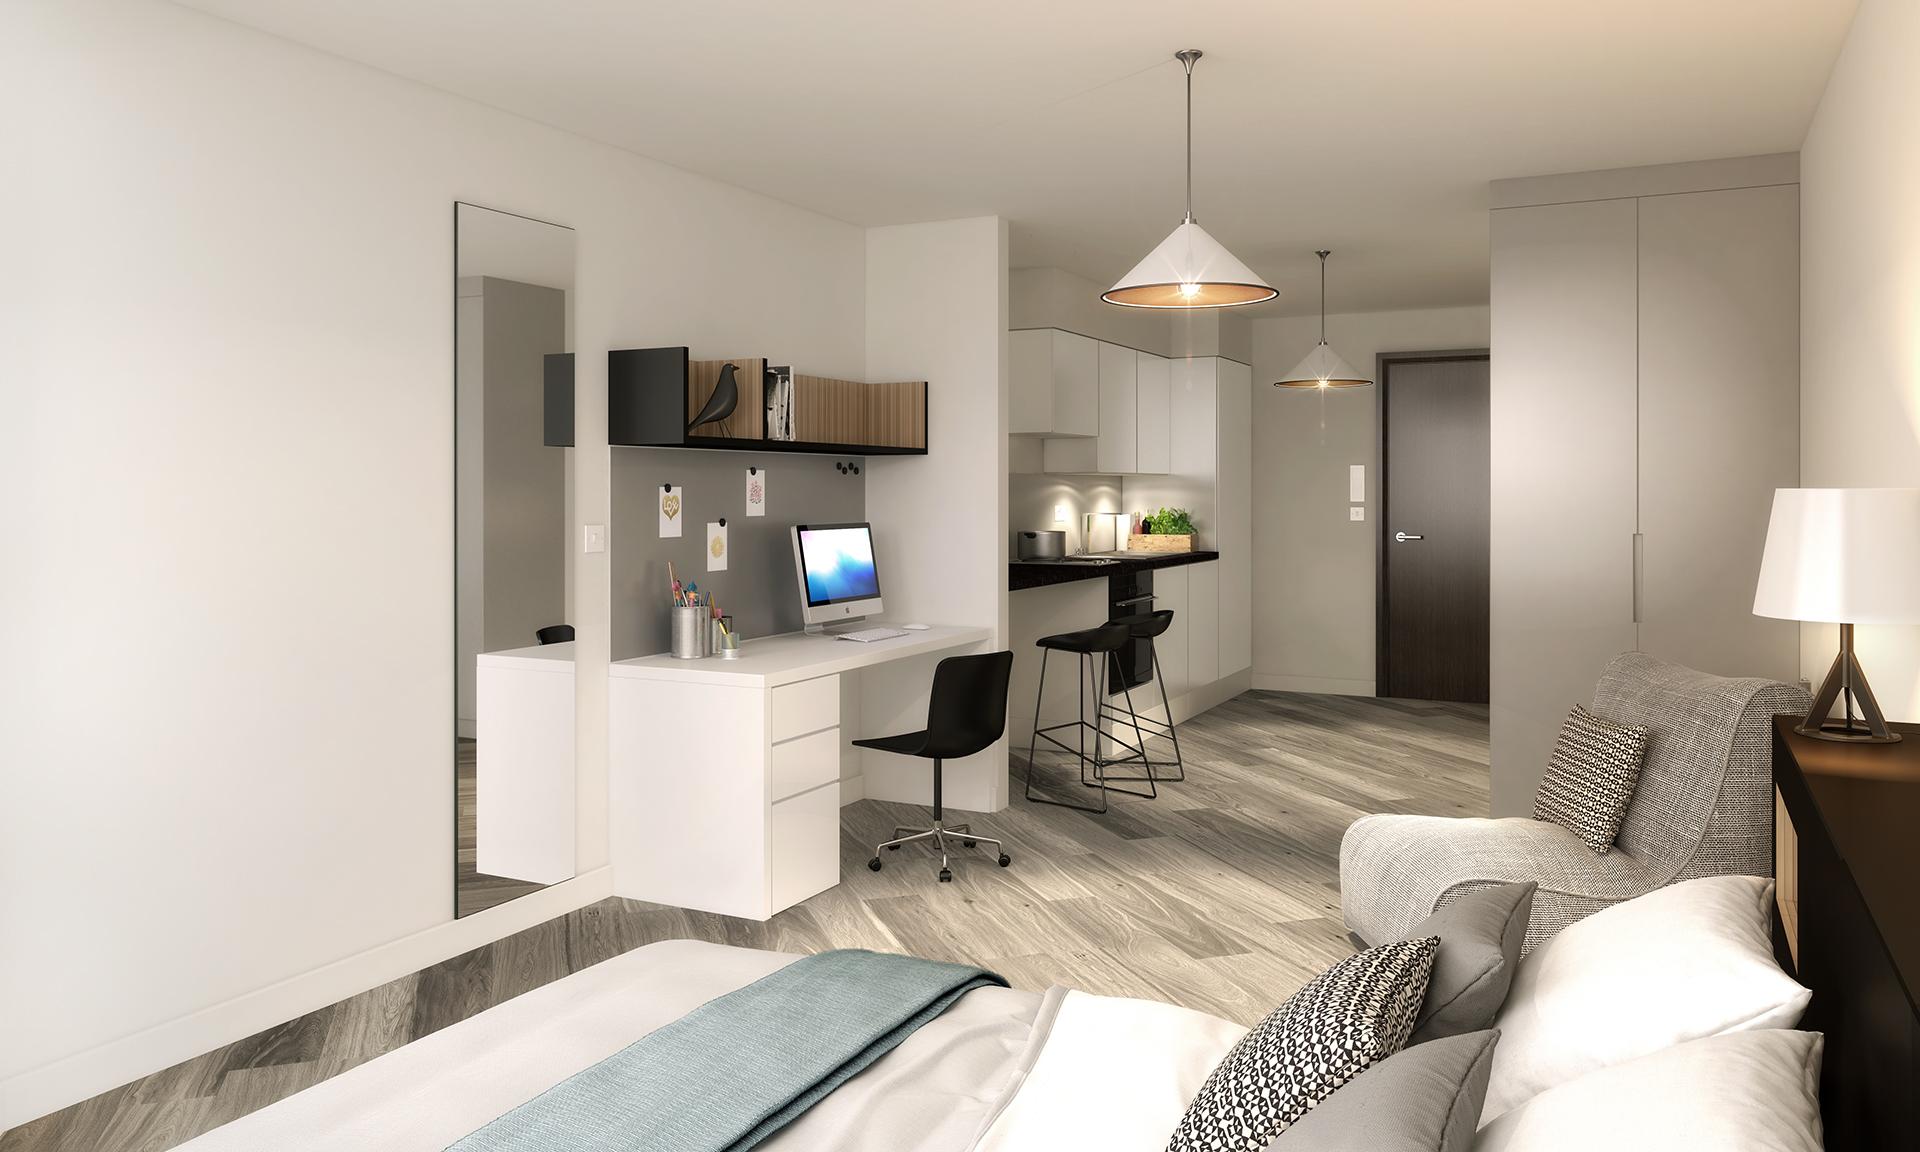 16015_FitzalanCourt_V3_Student Apartment_I_161006